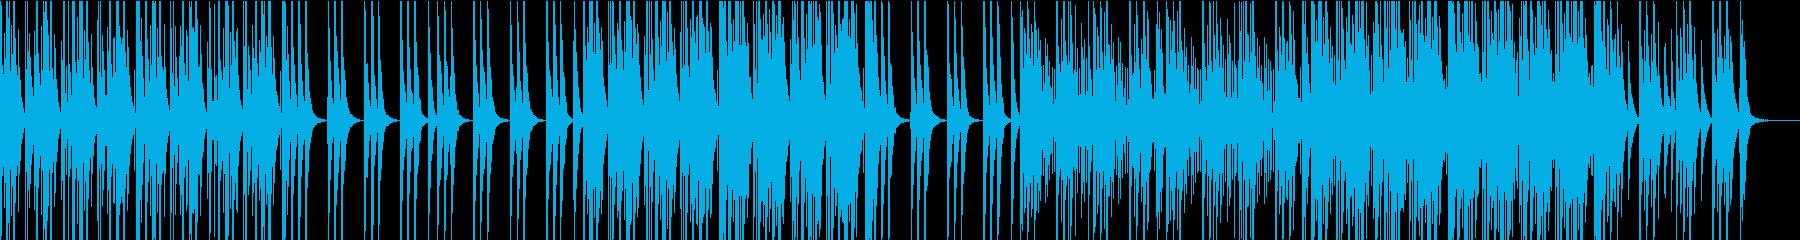 LowSampling Chilloutの再生済みの波形